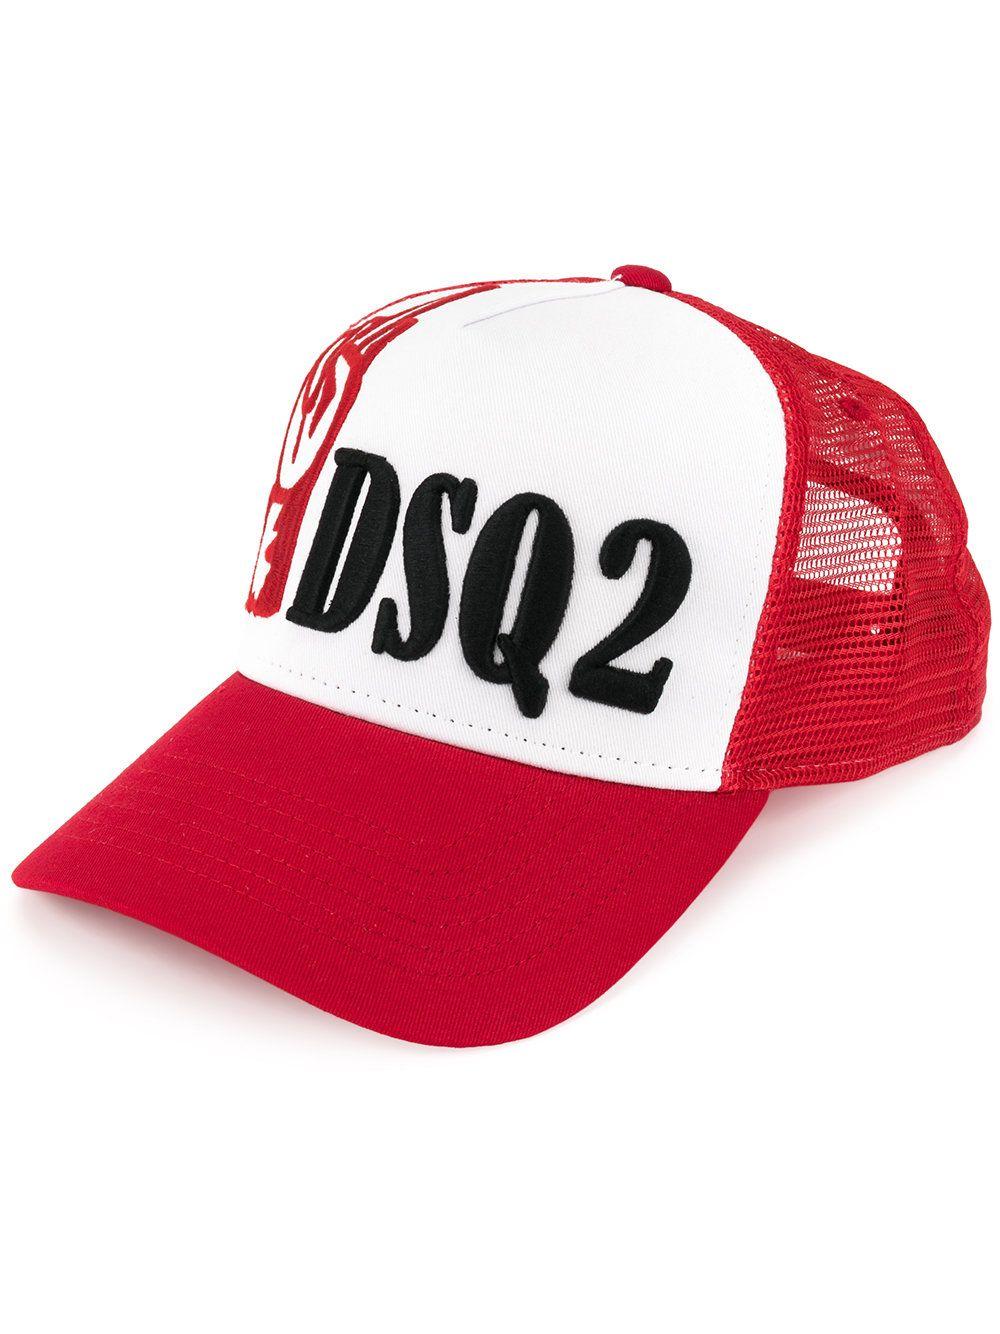 Dsquared2 Logo Baseball Cap In Red Dsquared2, Baseball